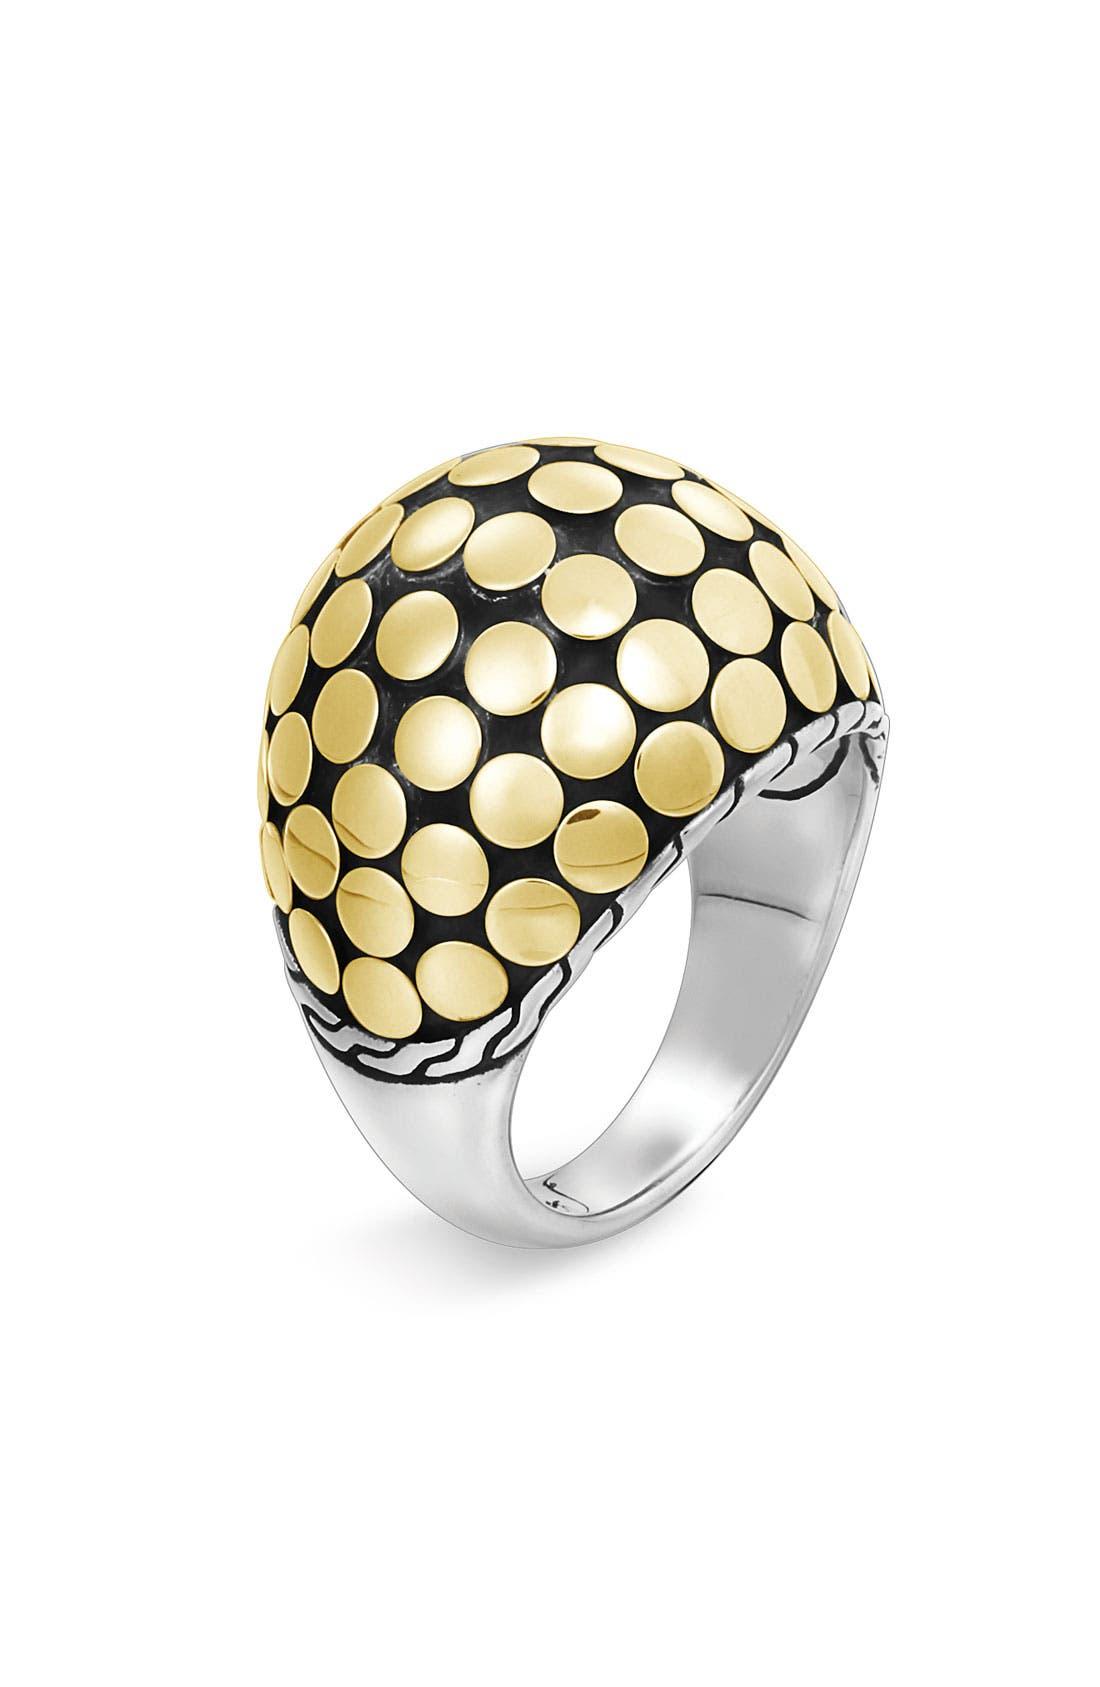 Main Image - John Hardy 'Dot Gold' Dome Ring